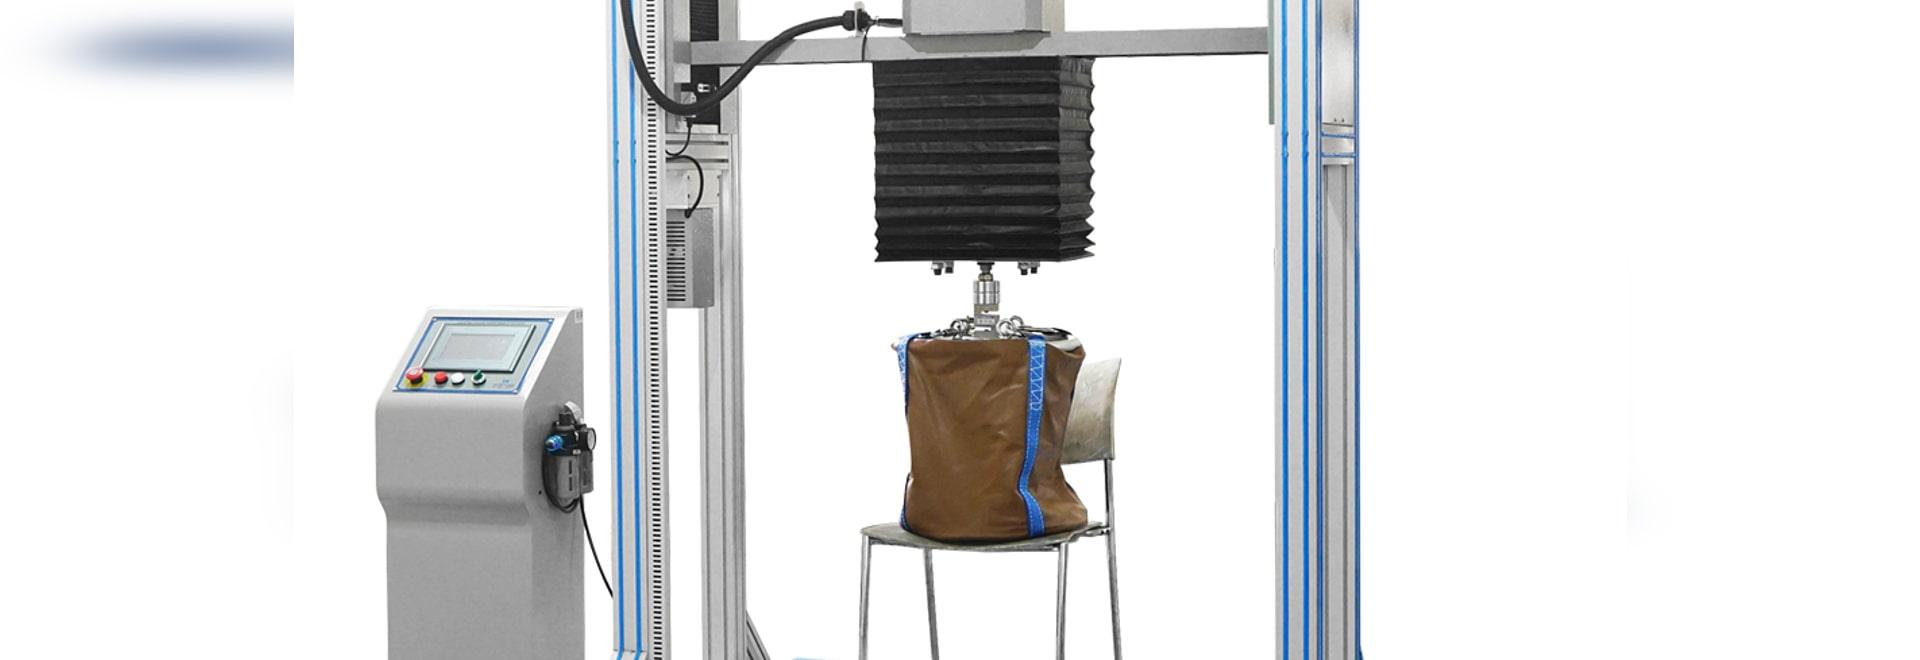 Swivel Durability Testing Equipment furniture Rotating Chair Machine